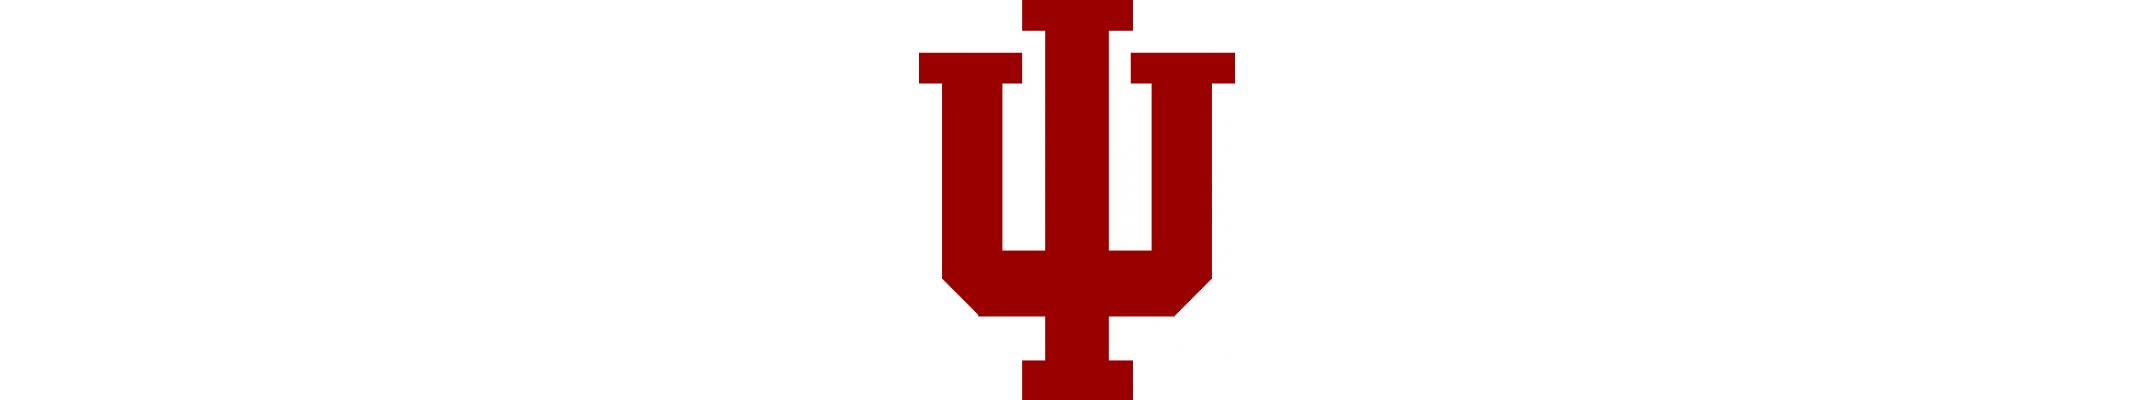 Indiana University Boards